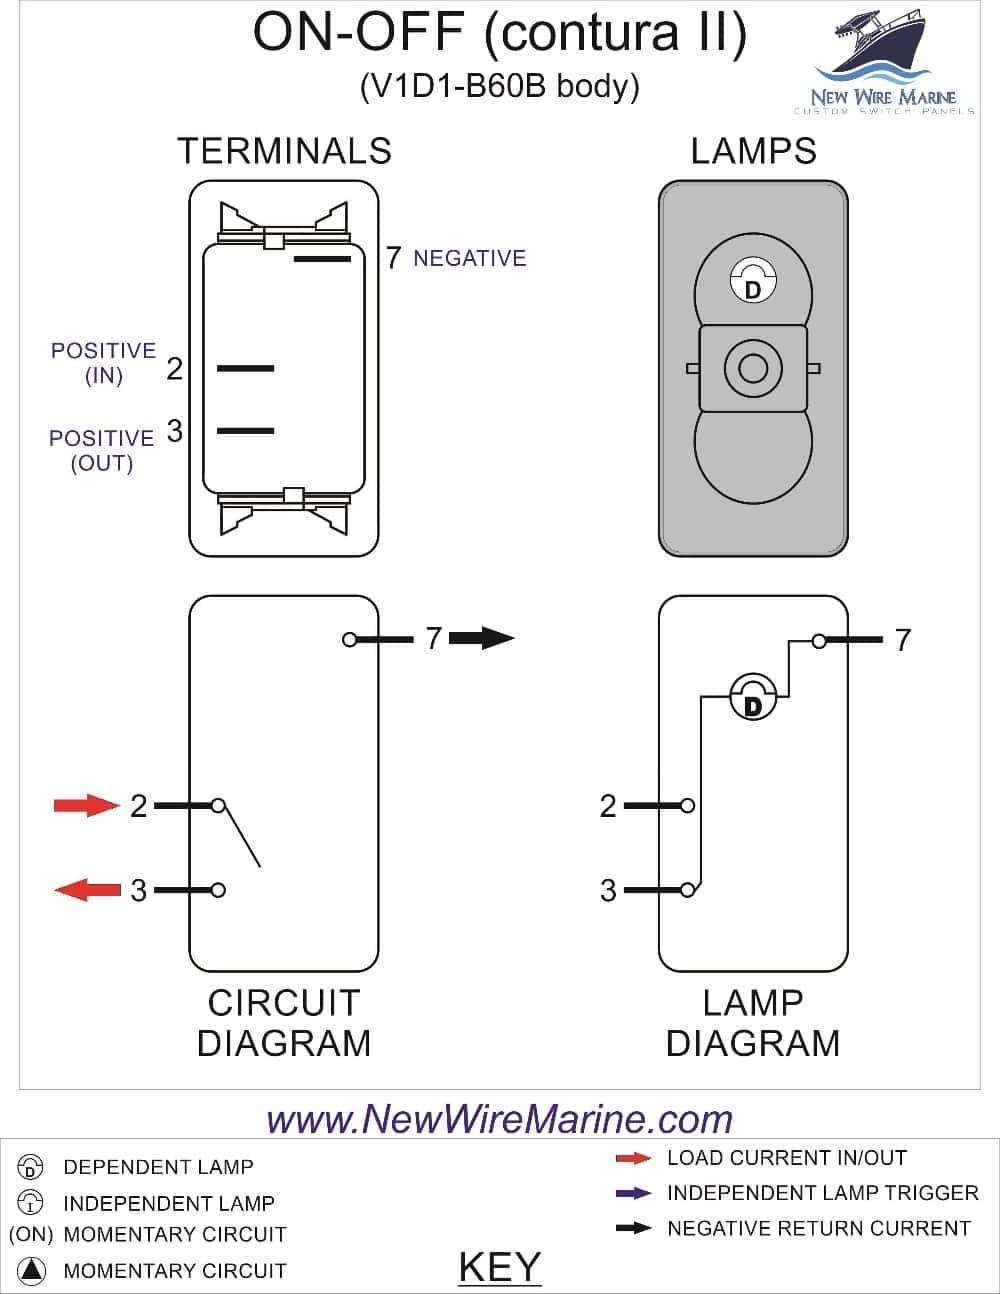 Spst 125vac Switch Wiring Diagram Portal Round Rocker Led Onoff 12vdc Amber Unique Image Rh Mainetreasurechest Com Double 3